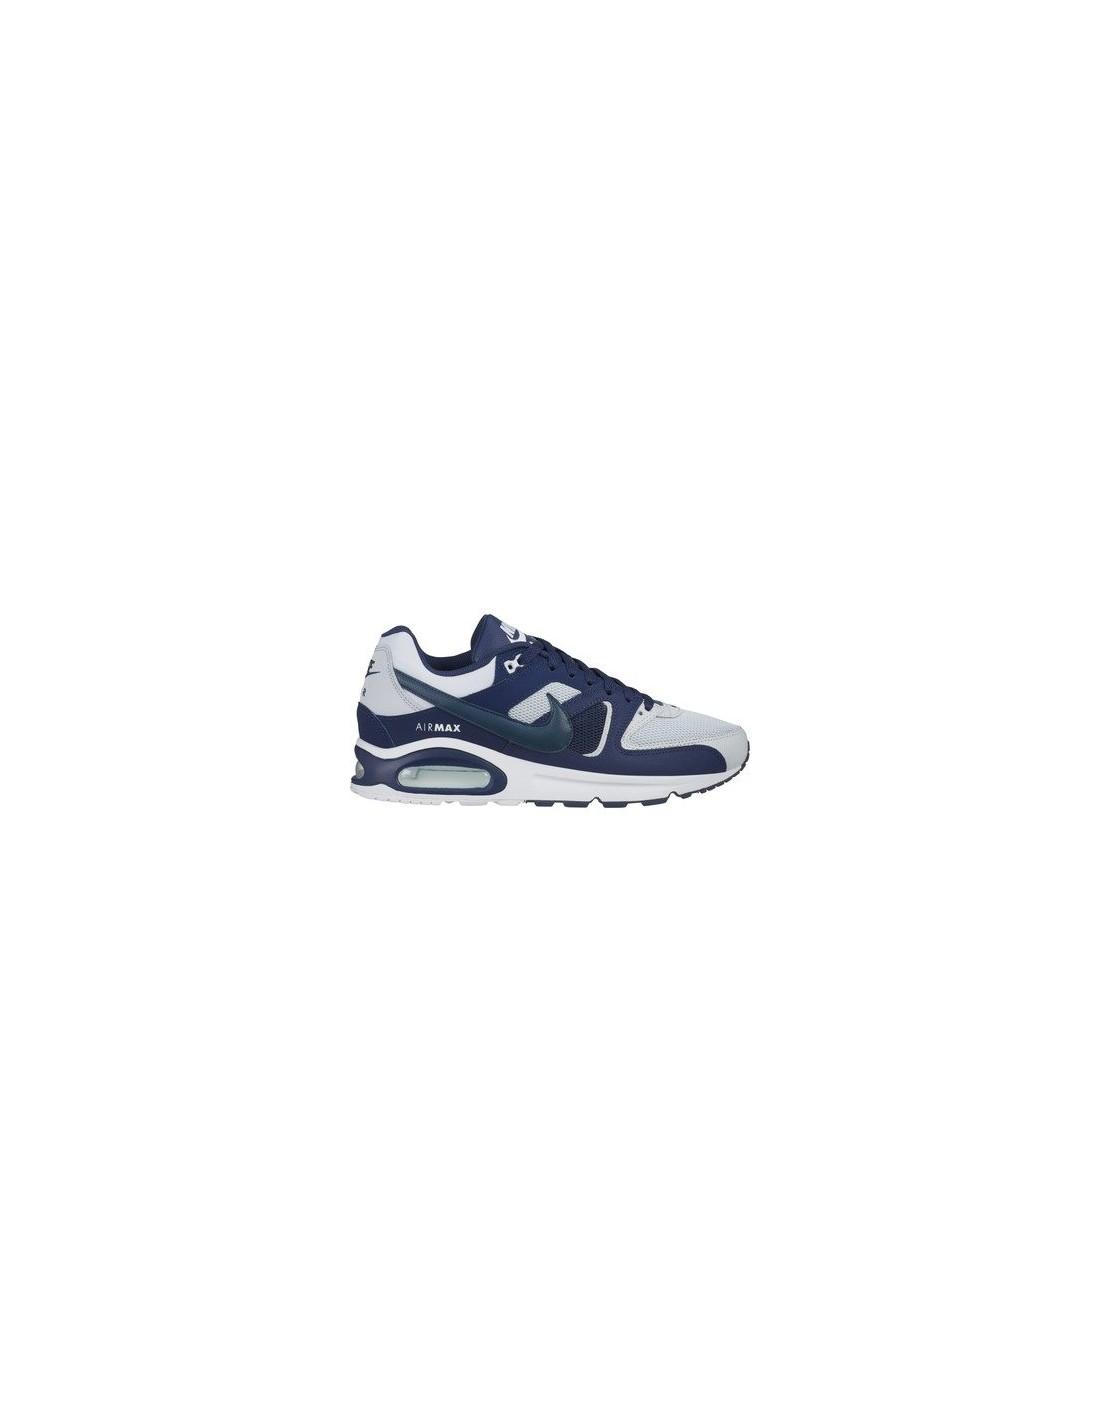 Fritidssko Herre Nike Air Max Command Men 629993 1,099.00